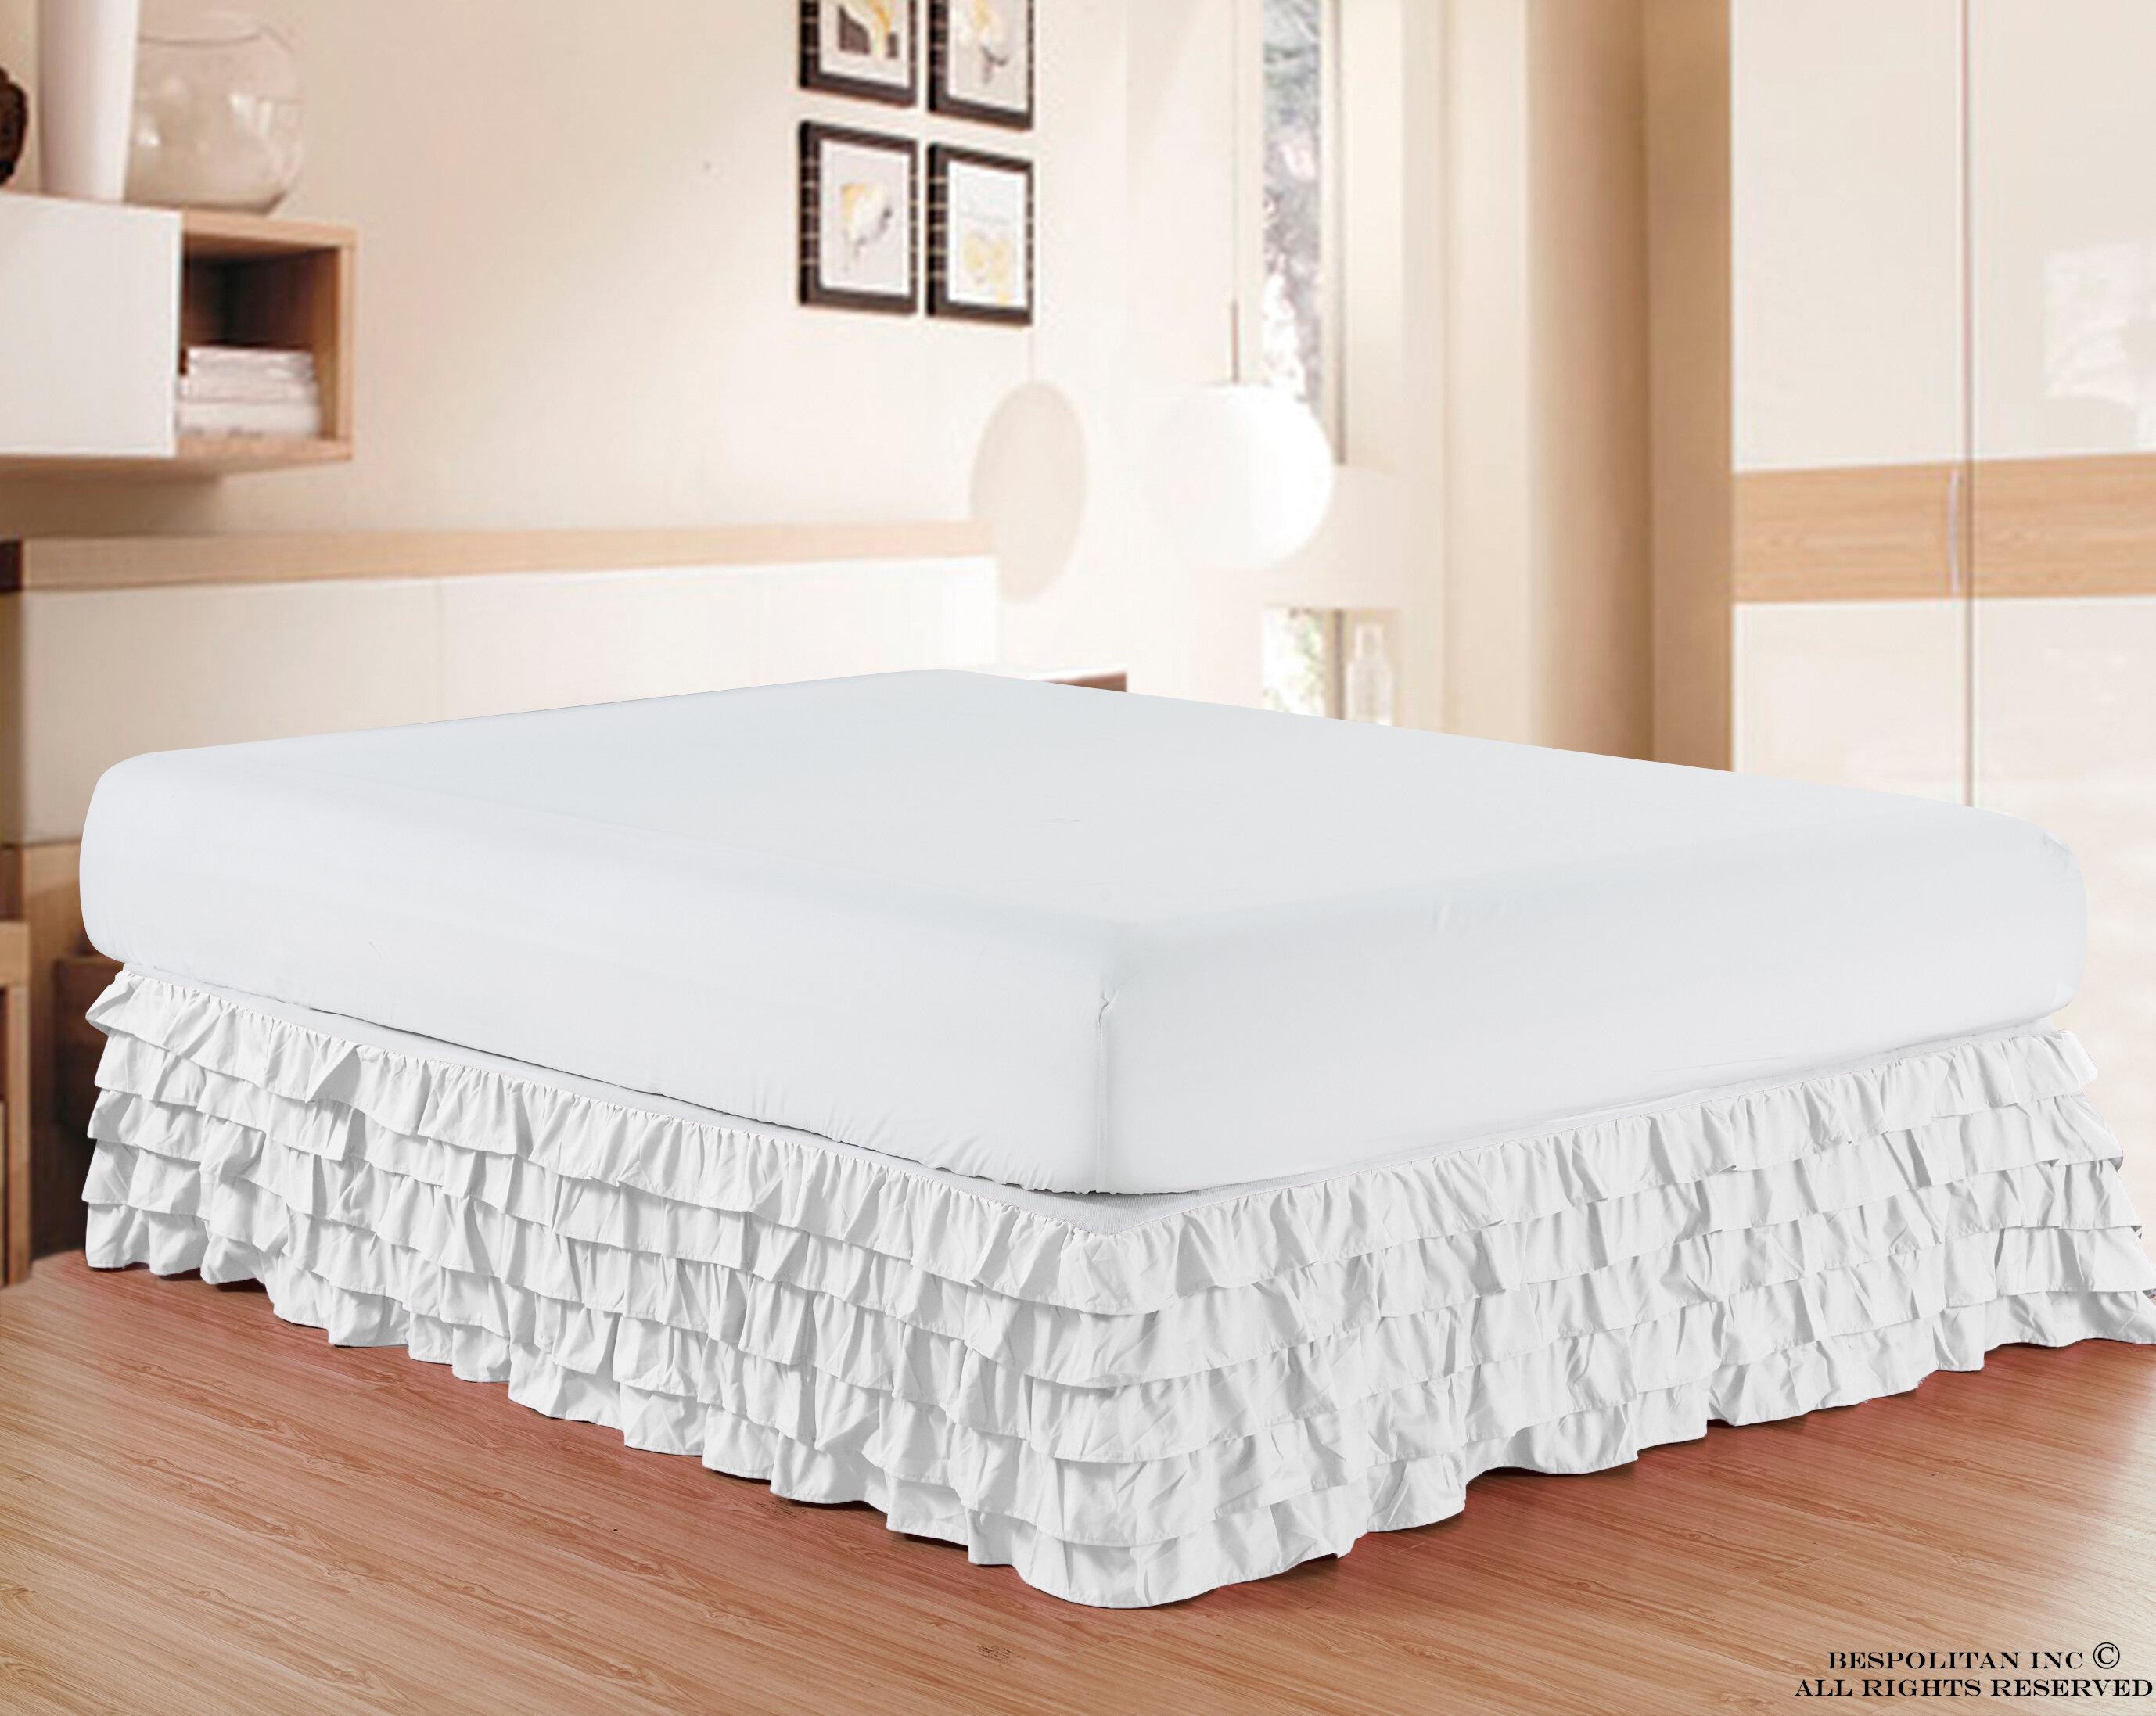 Beautiful White Bed Skirt Rust Ruffle Texture Layered Bedskirt King Or Queen Sz